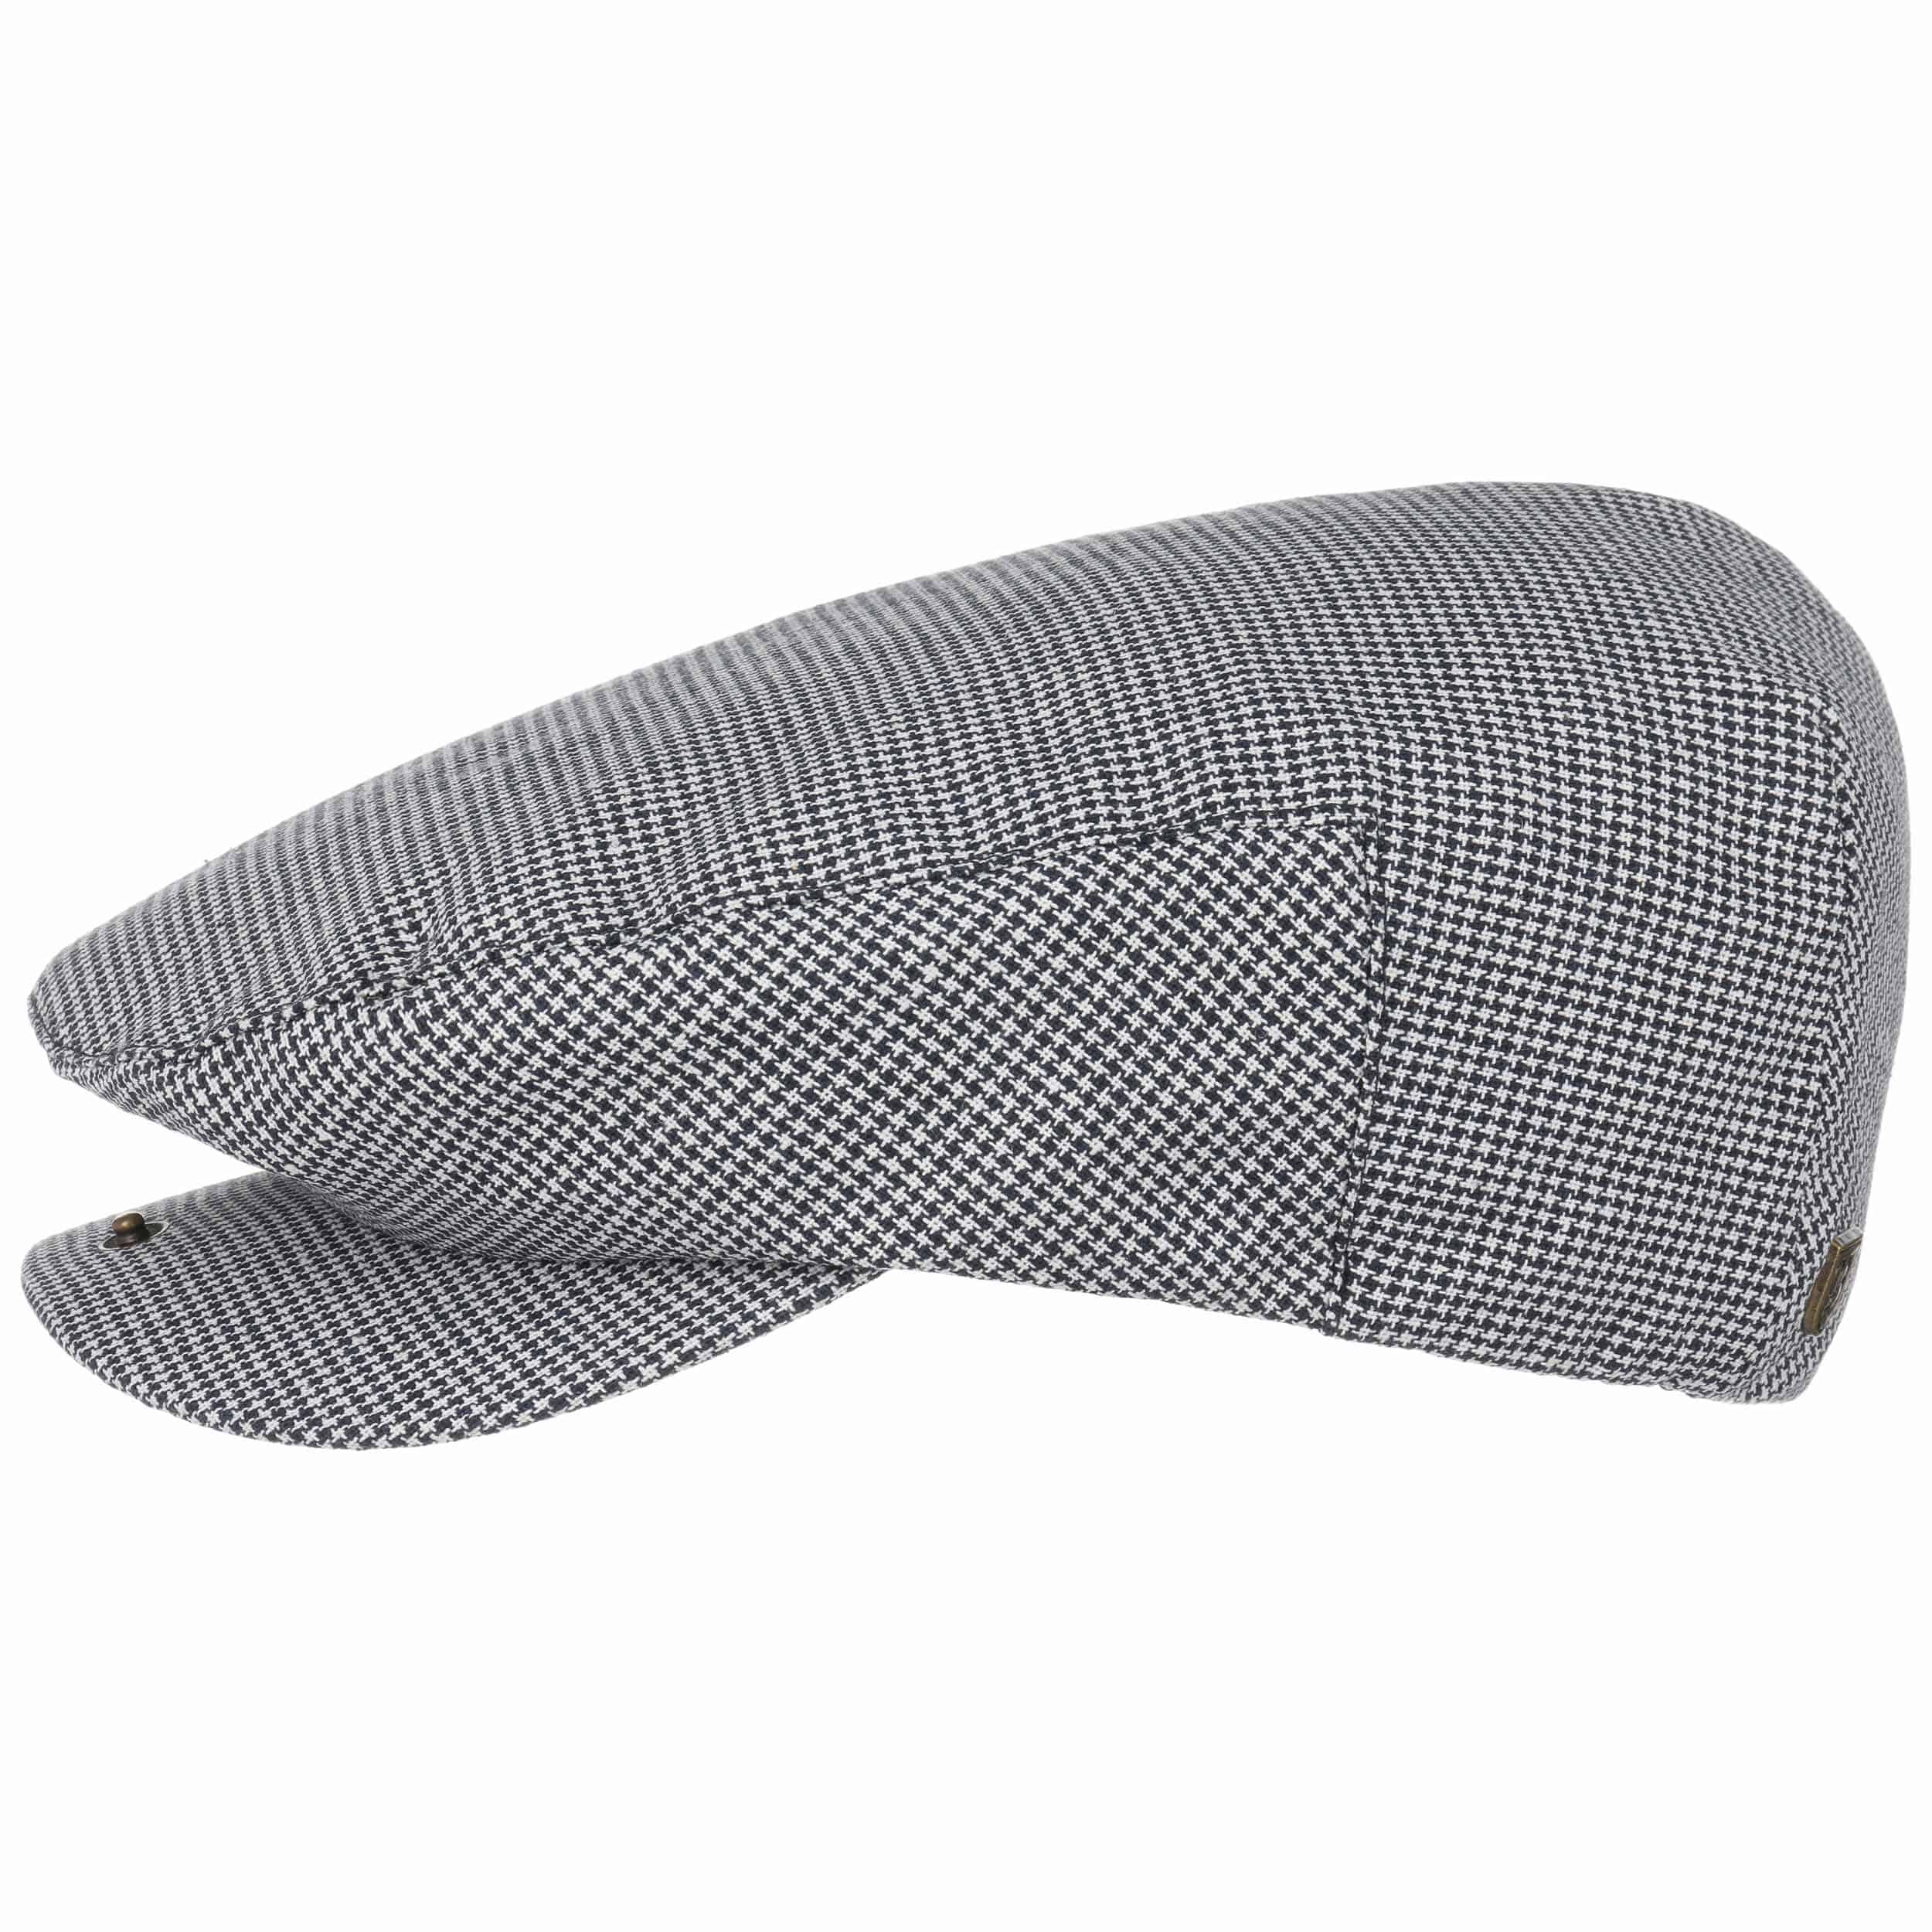 ... Hooligan Uni Flat Cap by Brixton - white 6 ... 2934ae16e2a0